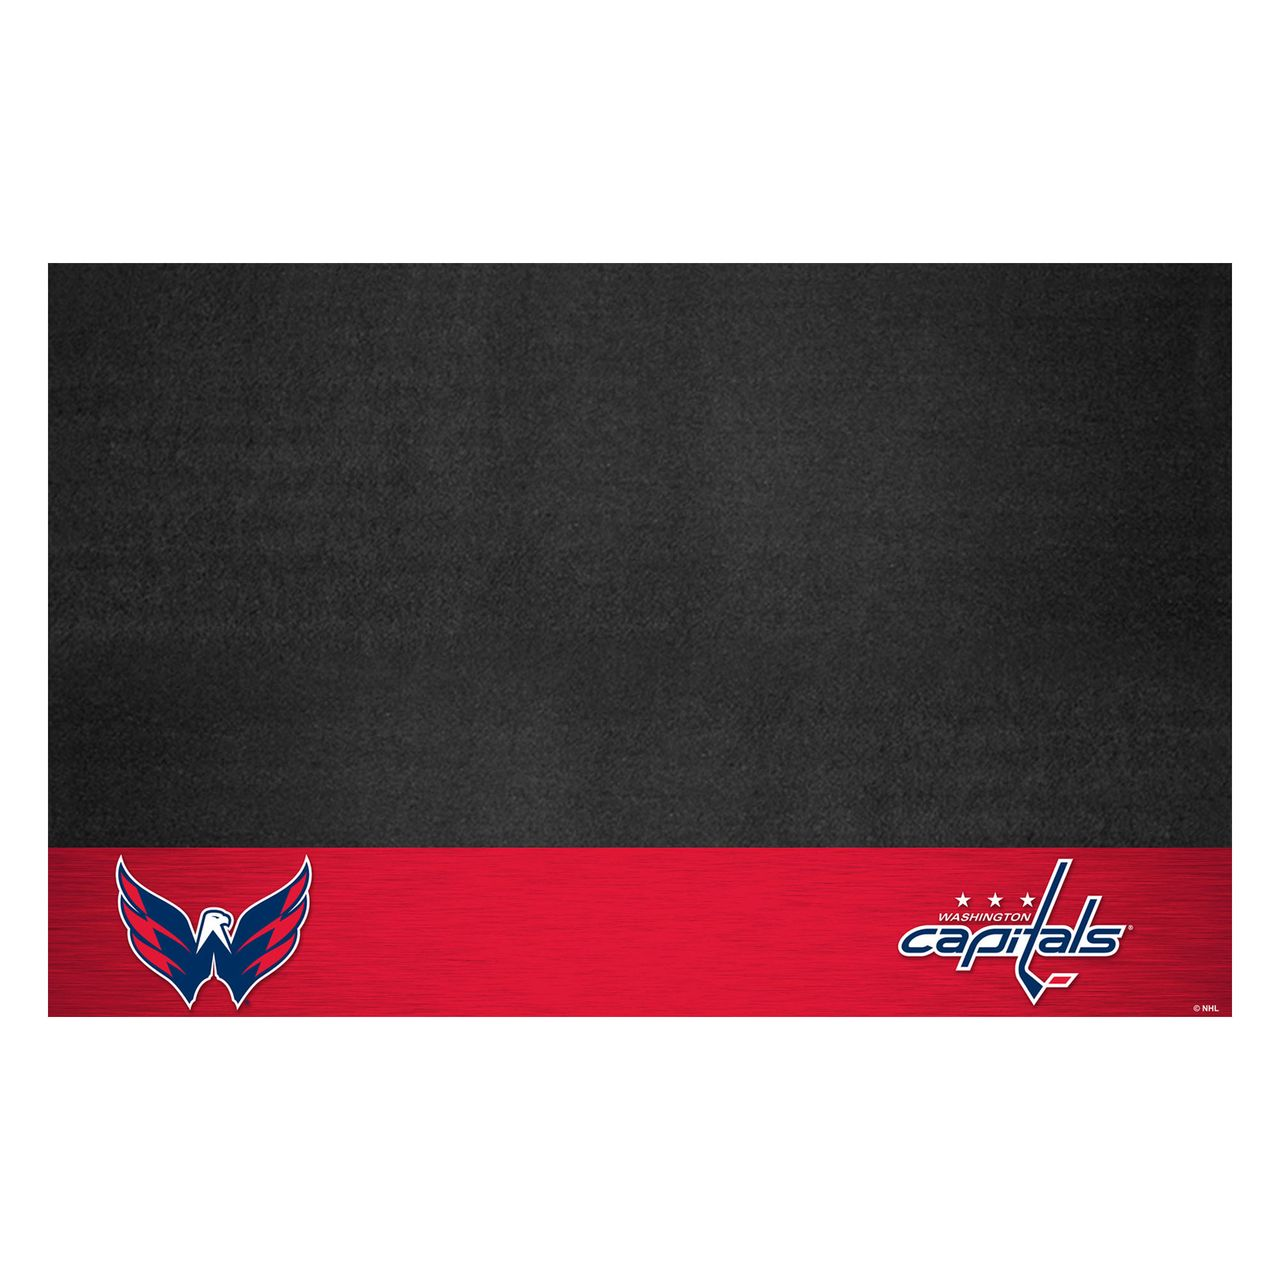 "Fanmats 14253 NHL - Washington Capitals Grill Mat 26""x42"""